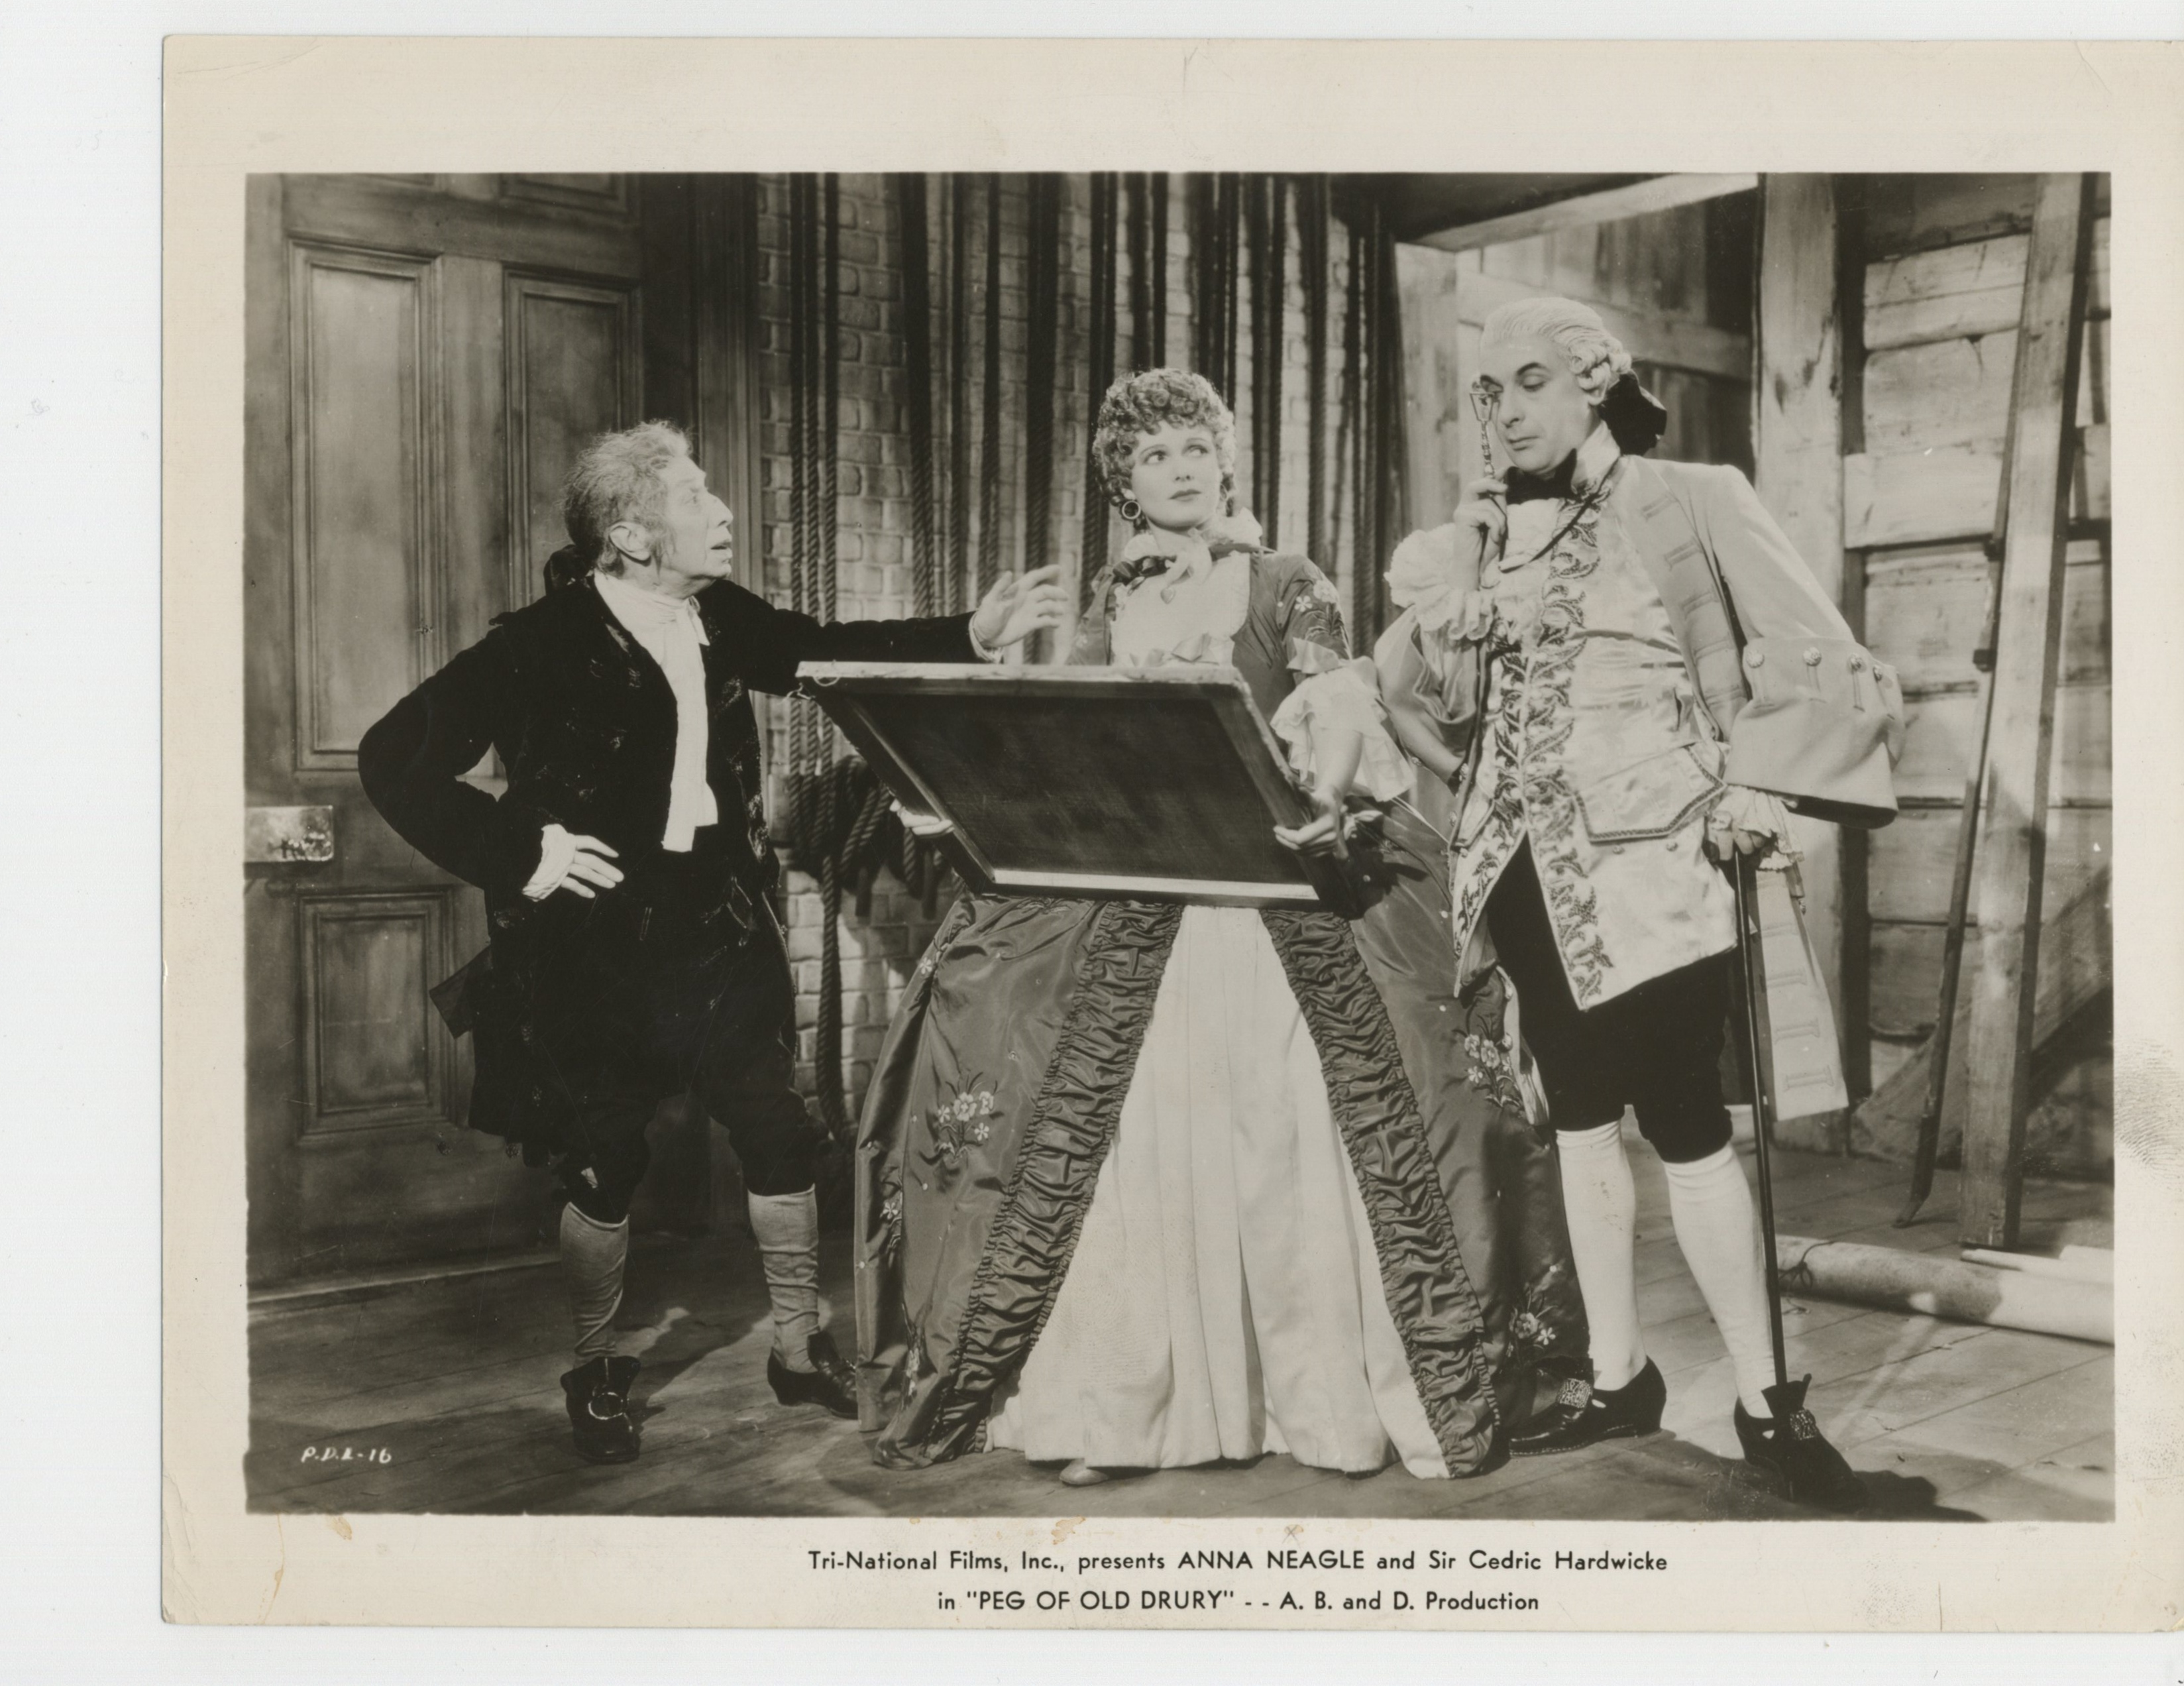 Cedric Hardwicke and Anna Neagle in Peg of Old Drury (1935)